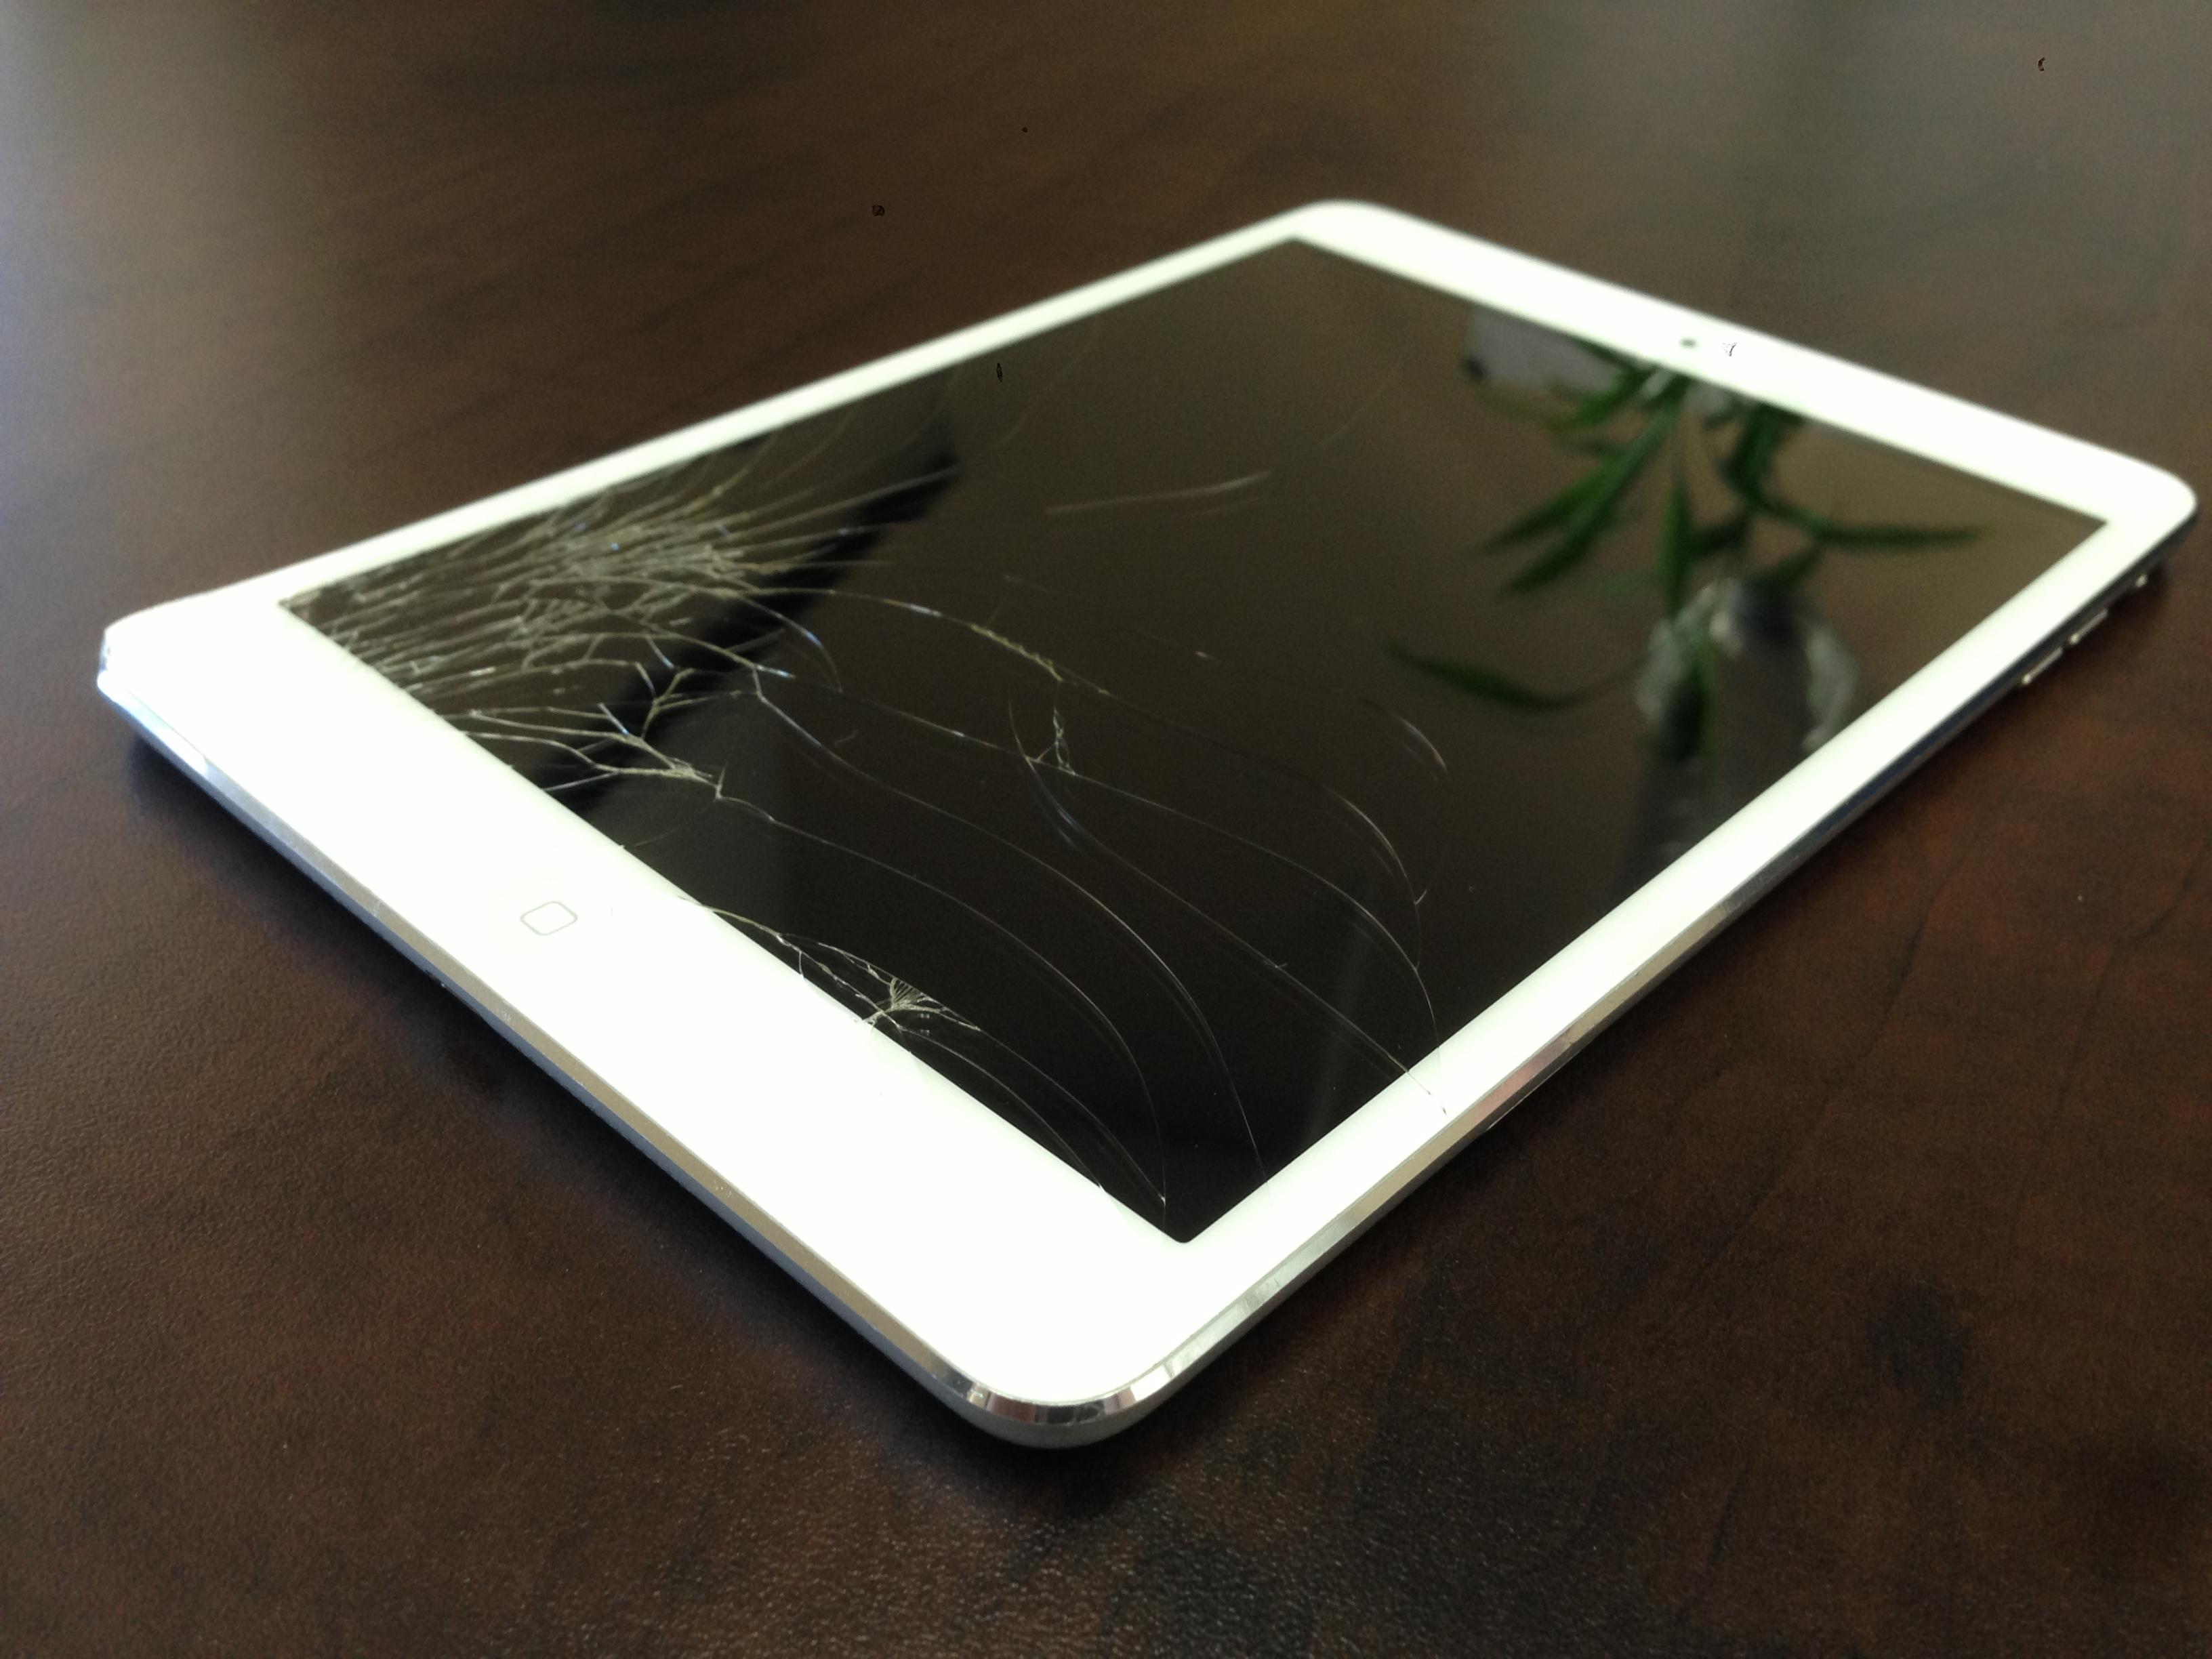 cracked ipad mini can mission repair fix this